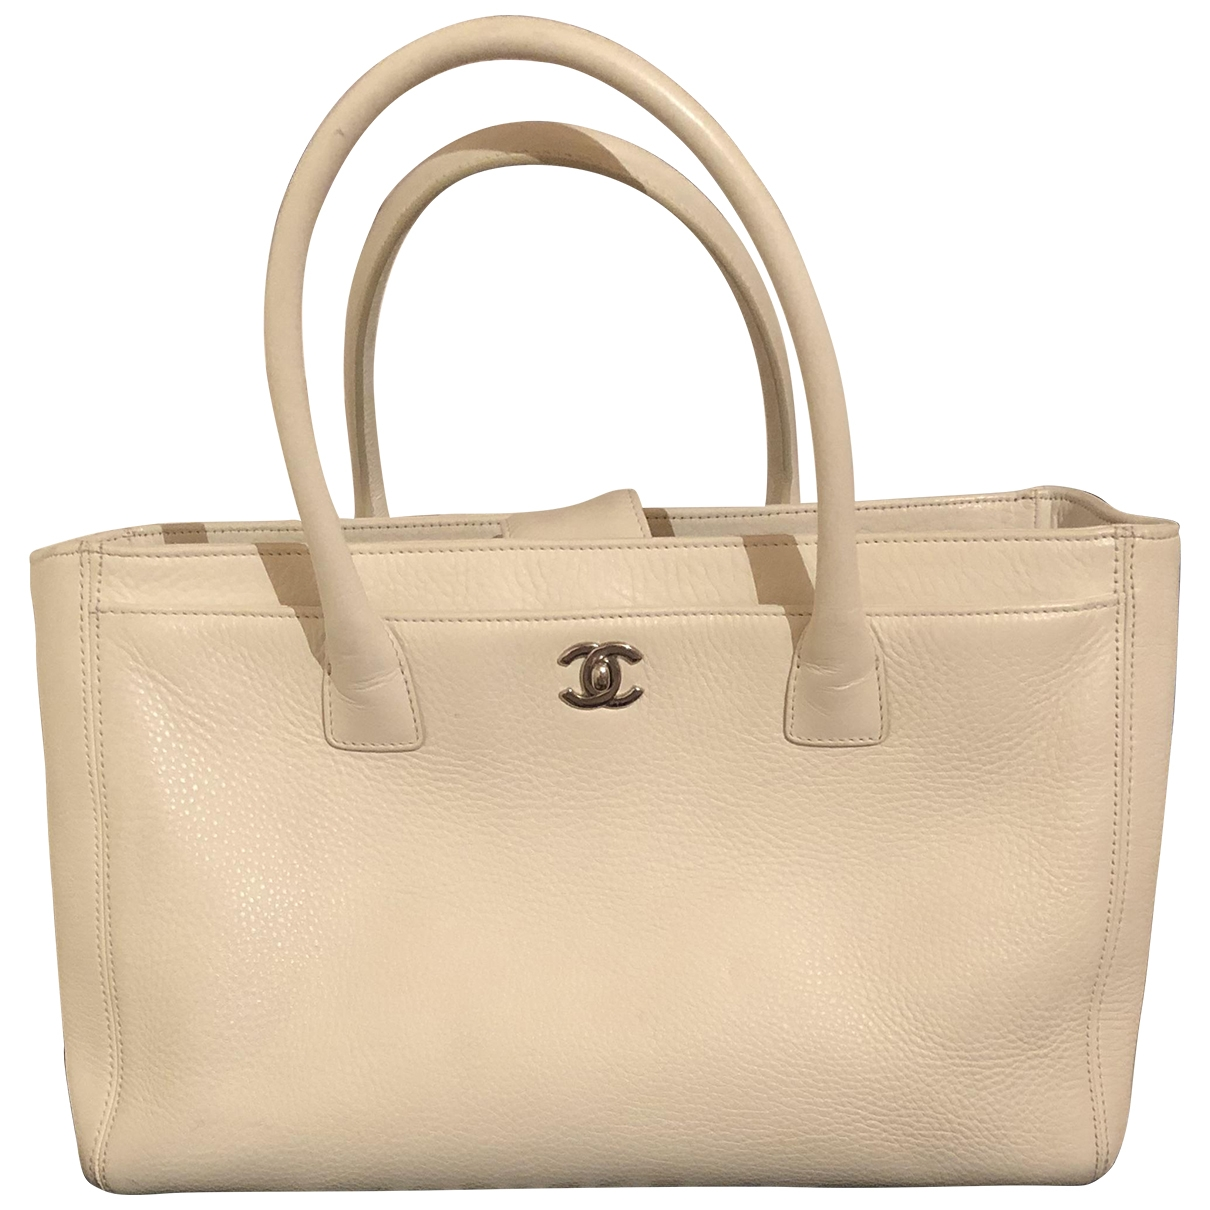 Chanel Executive White Leather handbag for Women \N